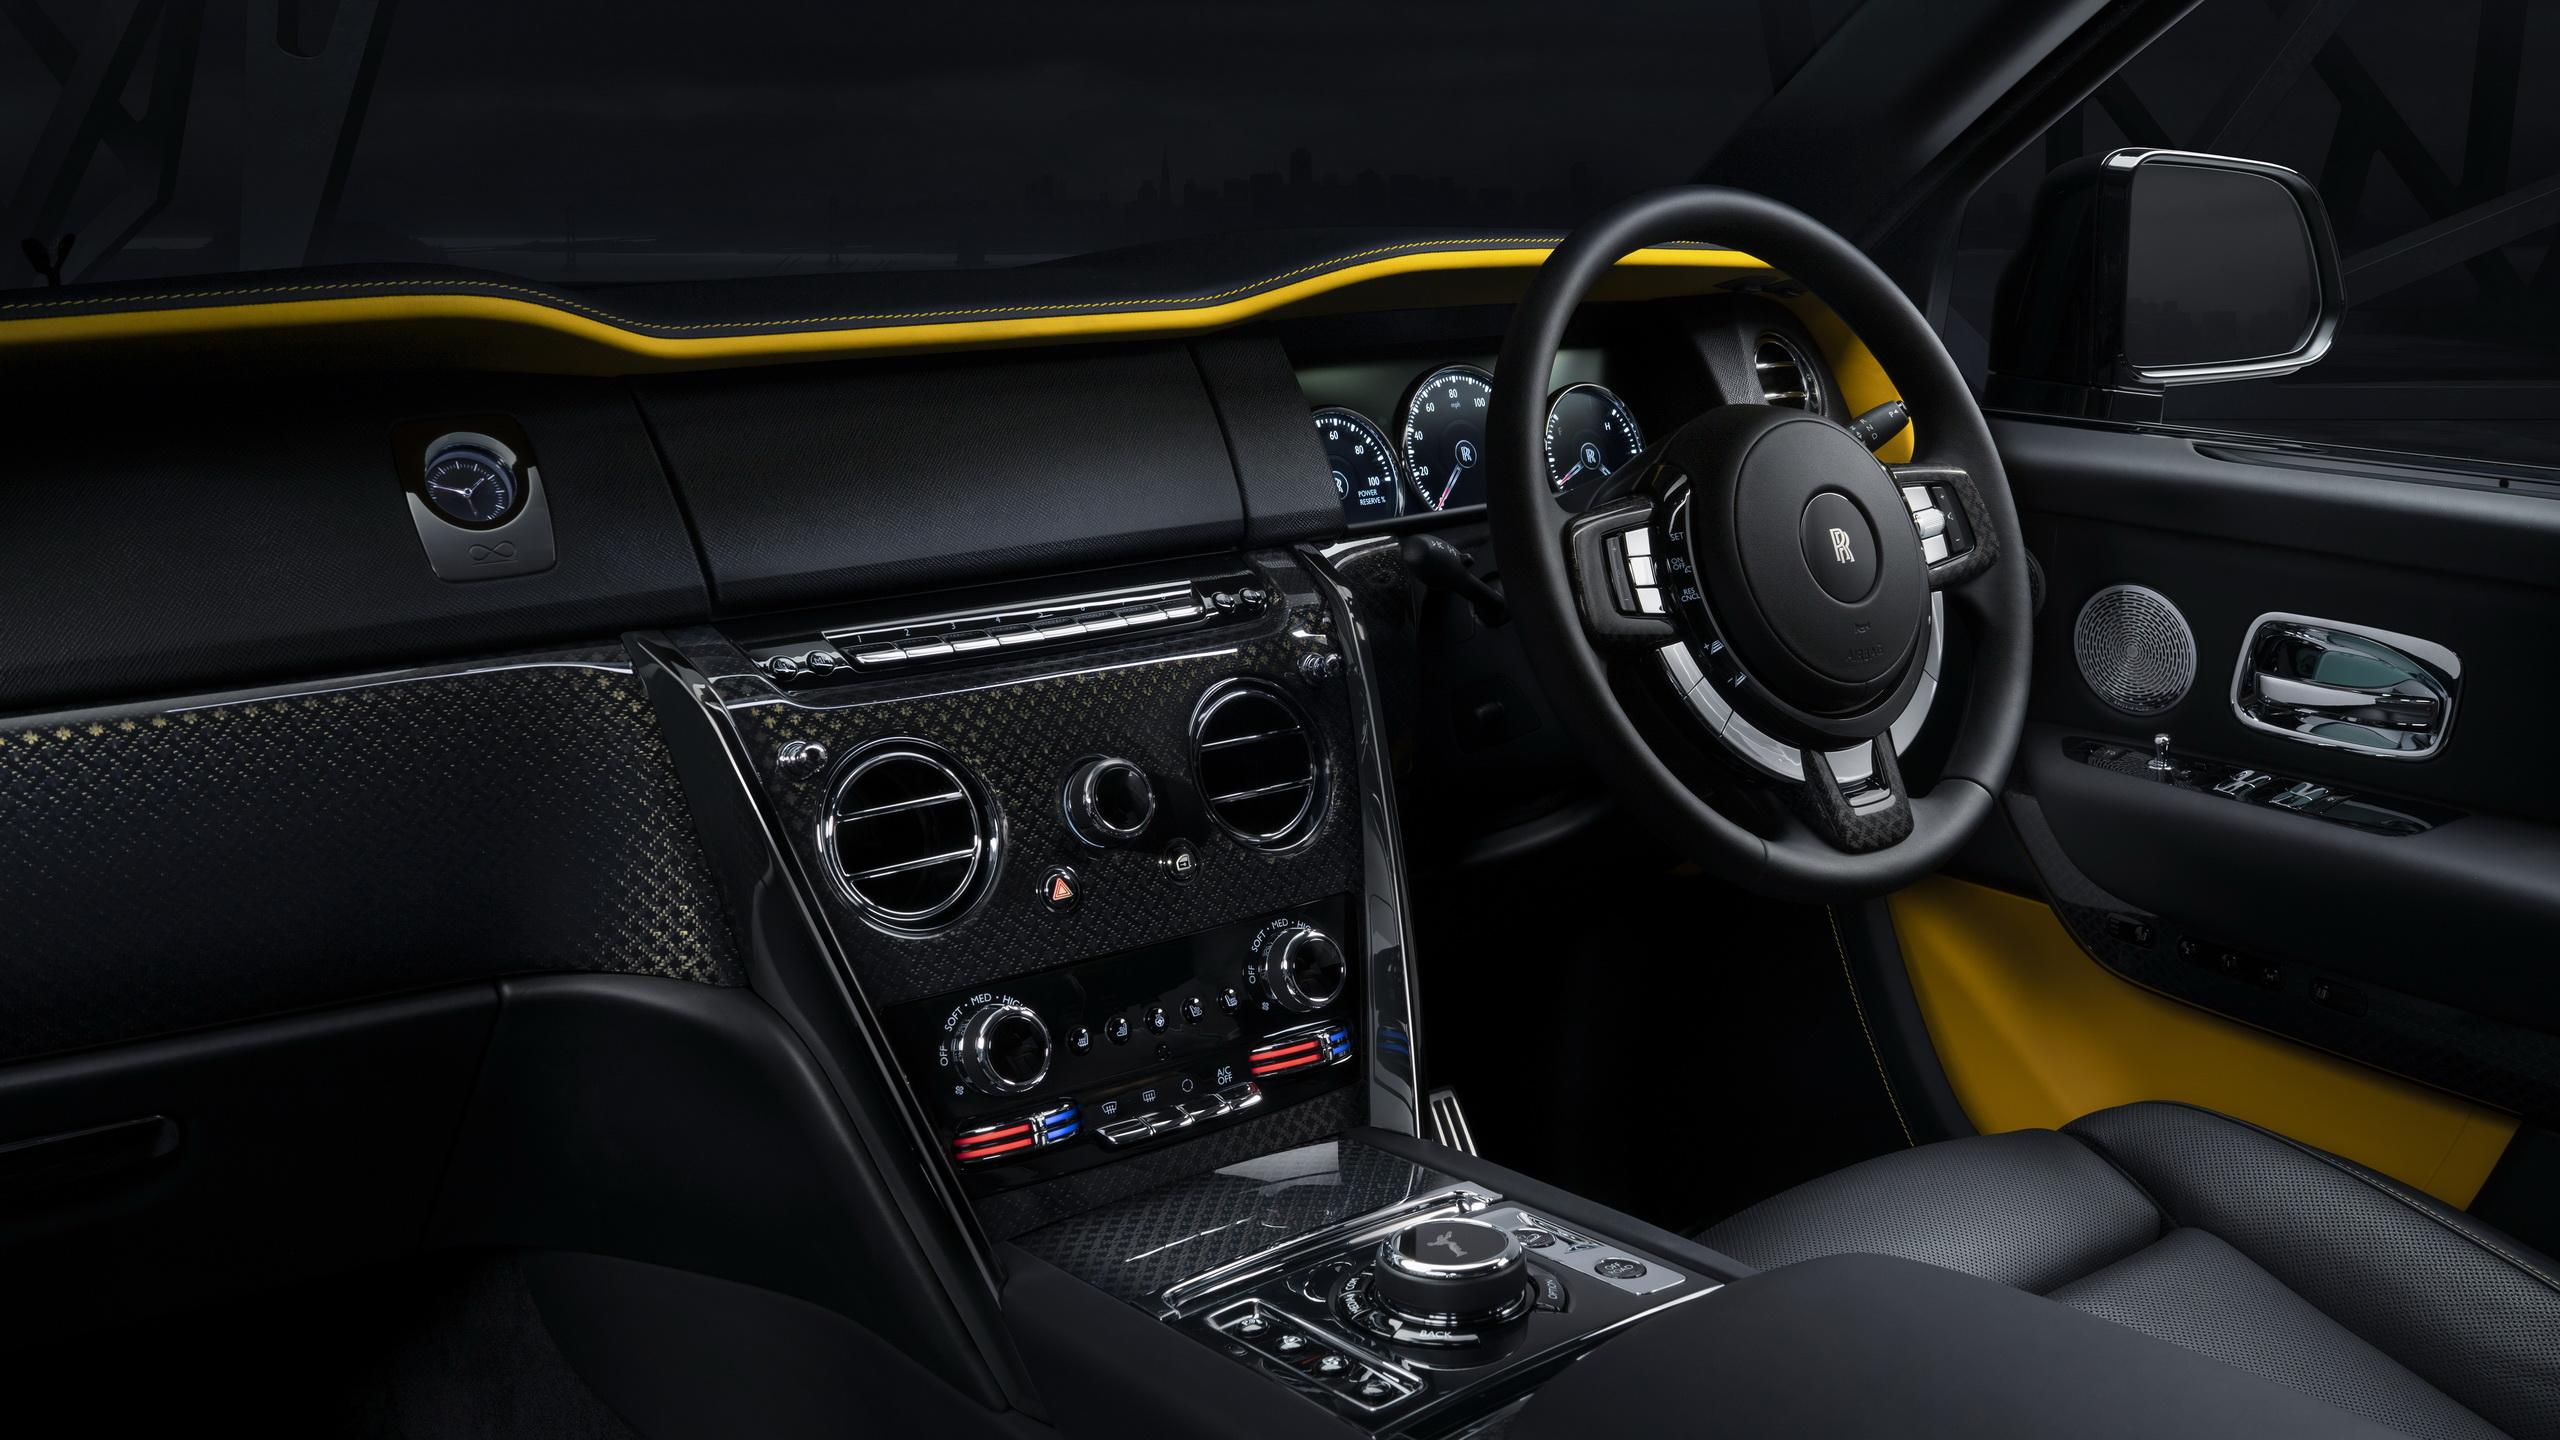 Rolls Royce Cullinan Black Badge 2019 4k Interior Hd Wallpaper 2560x1440 1356938 Wallpaperup